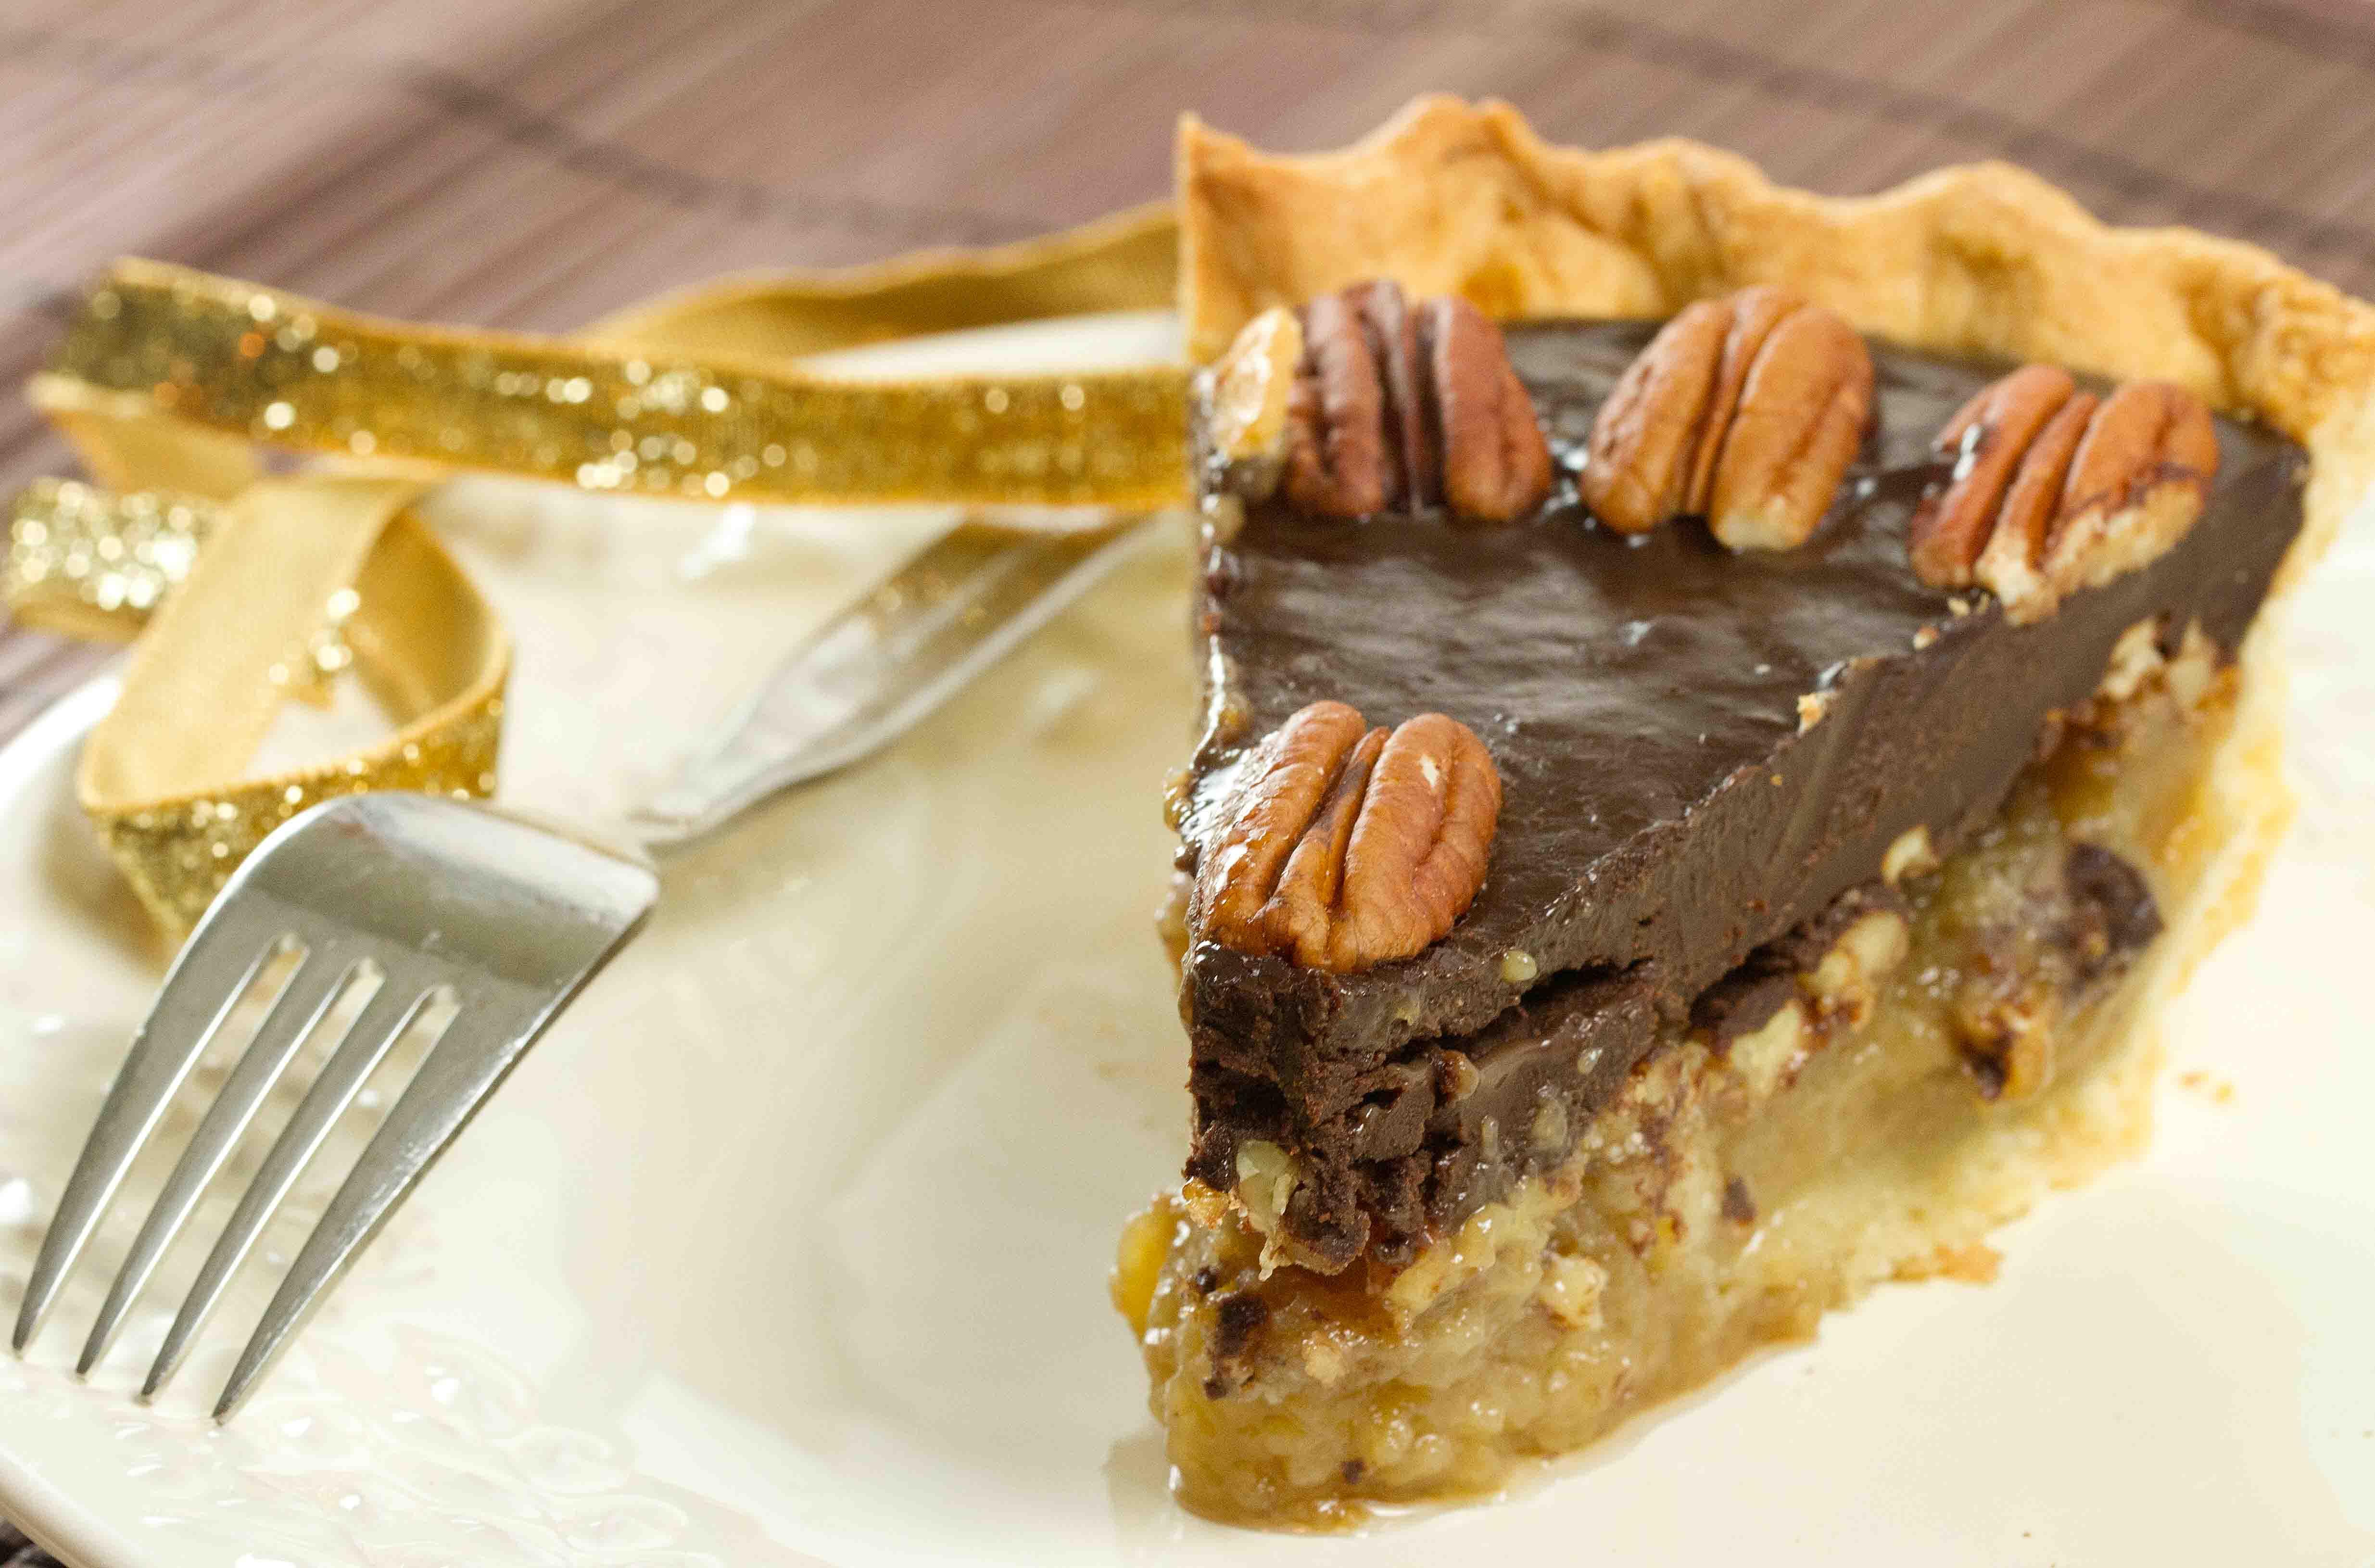 Bourbon Pecan Pie with Chocolate Ganache